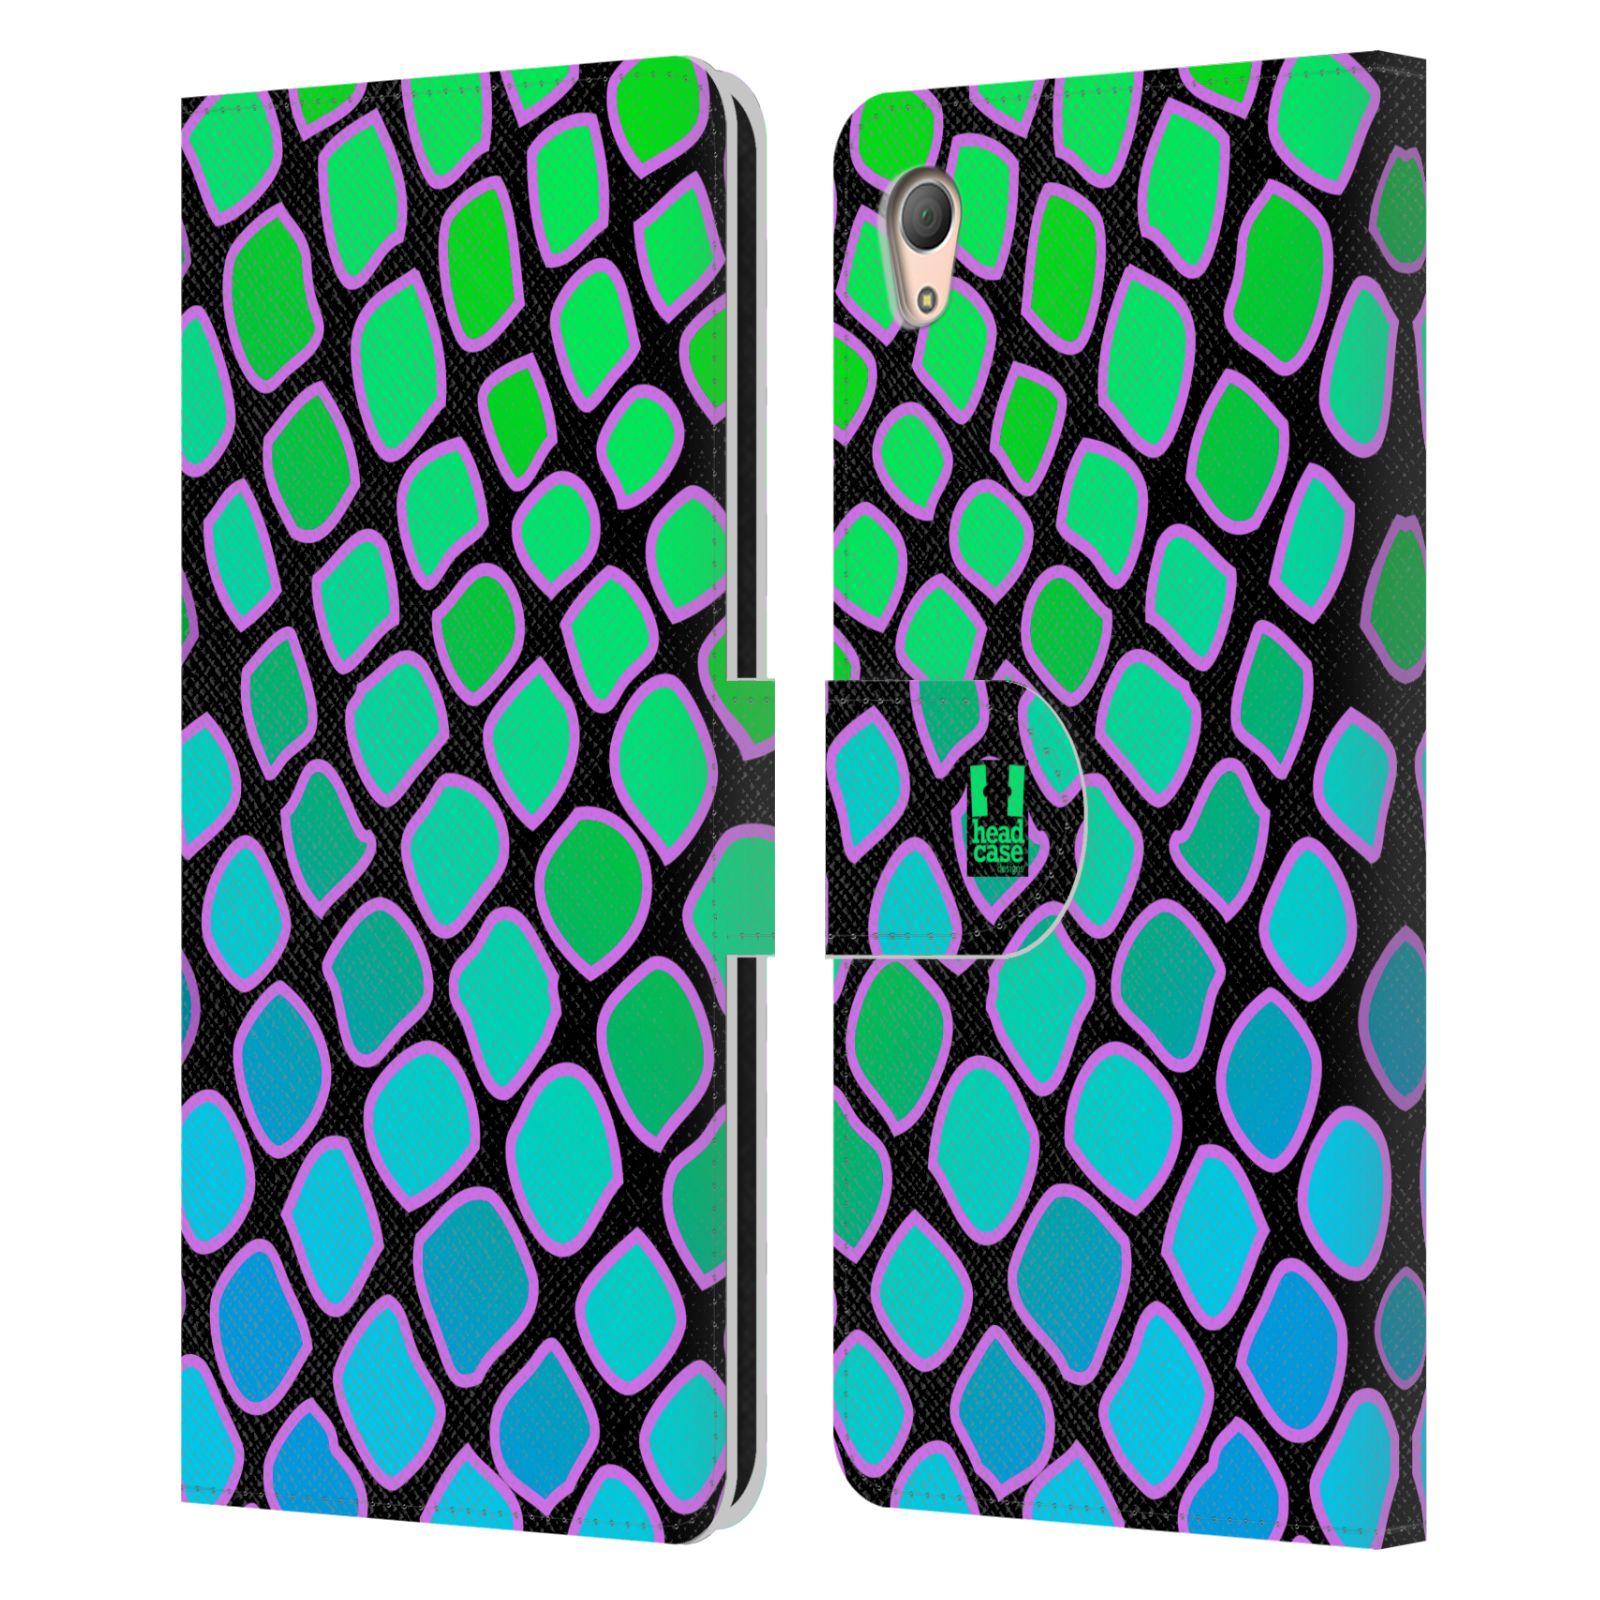 HEAD CASE Flipové pouzdro pro mobil SONY XPERIA Z3+ (PLUS) Zvířecí barevné vzory vodní had modrá a zelená barva AQUA